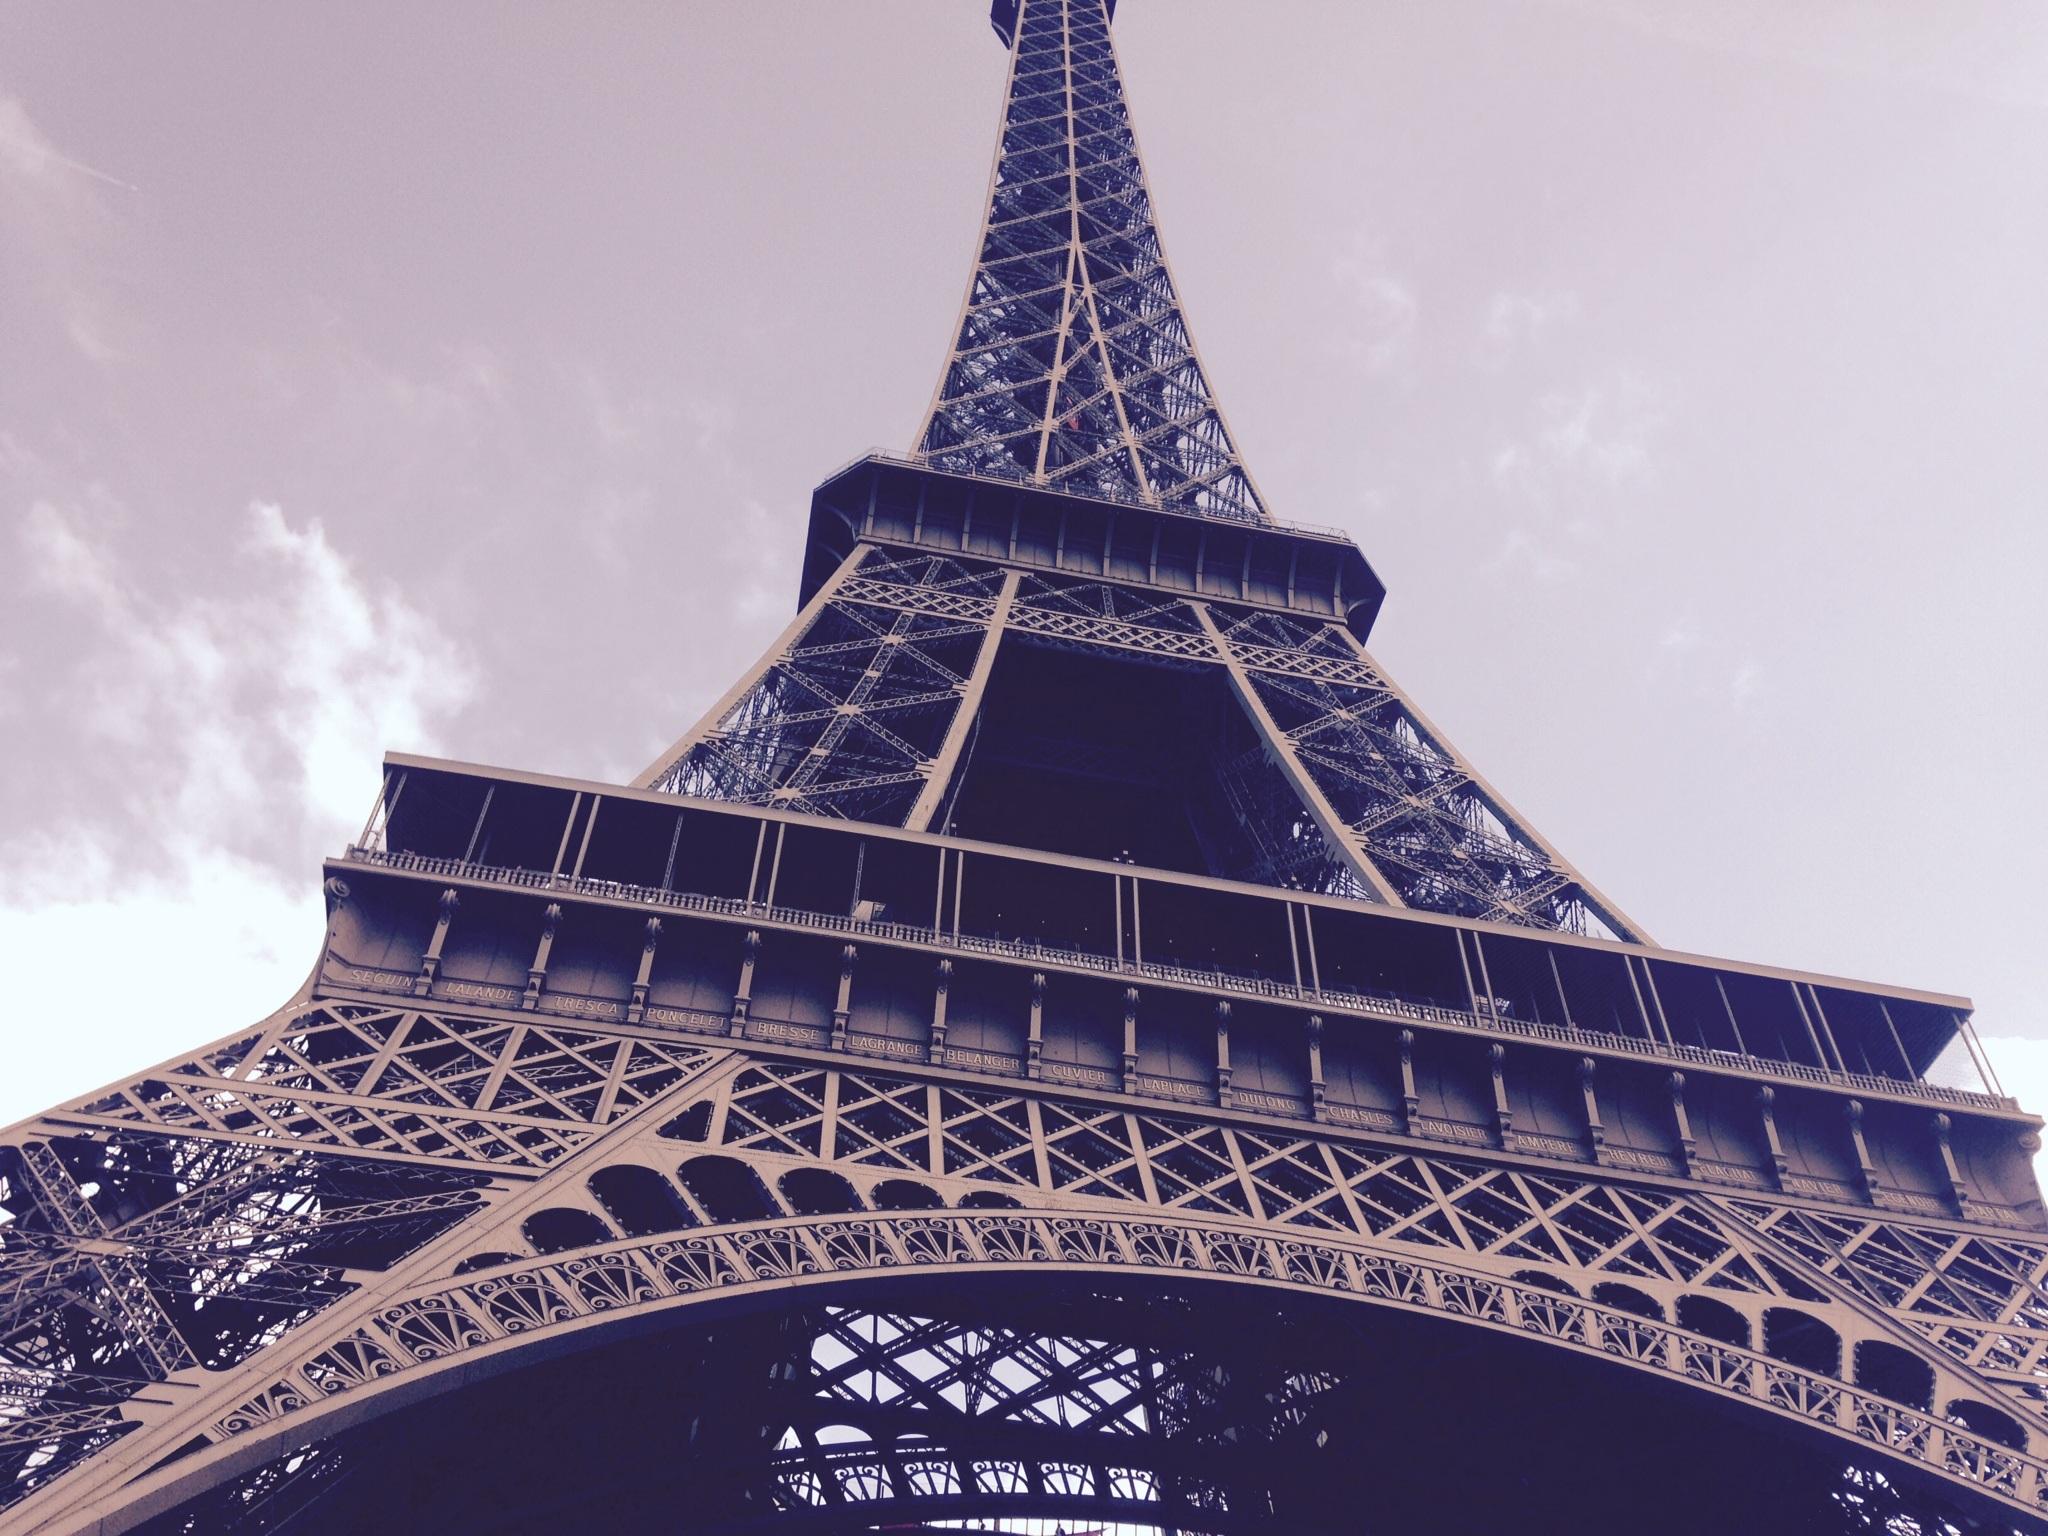 Gambar Pemandangan Arsitektur Struktur Bangunan Menara